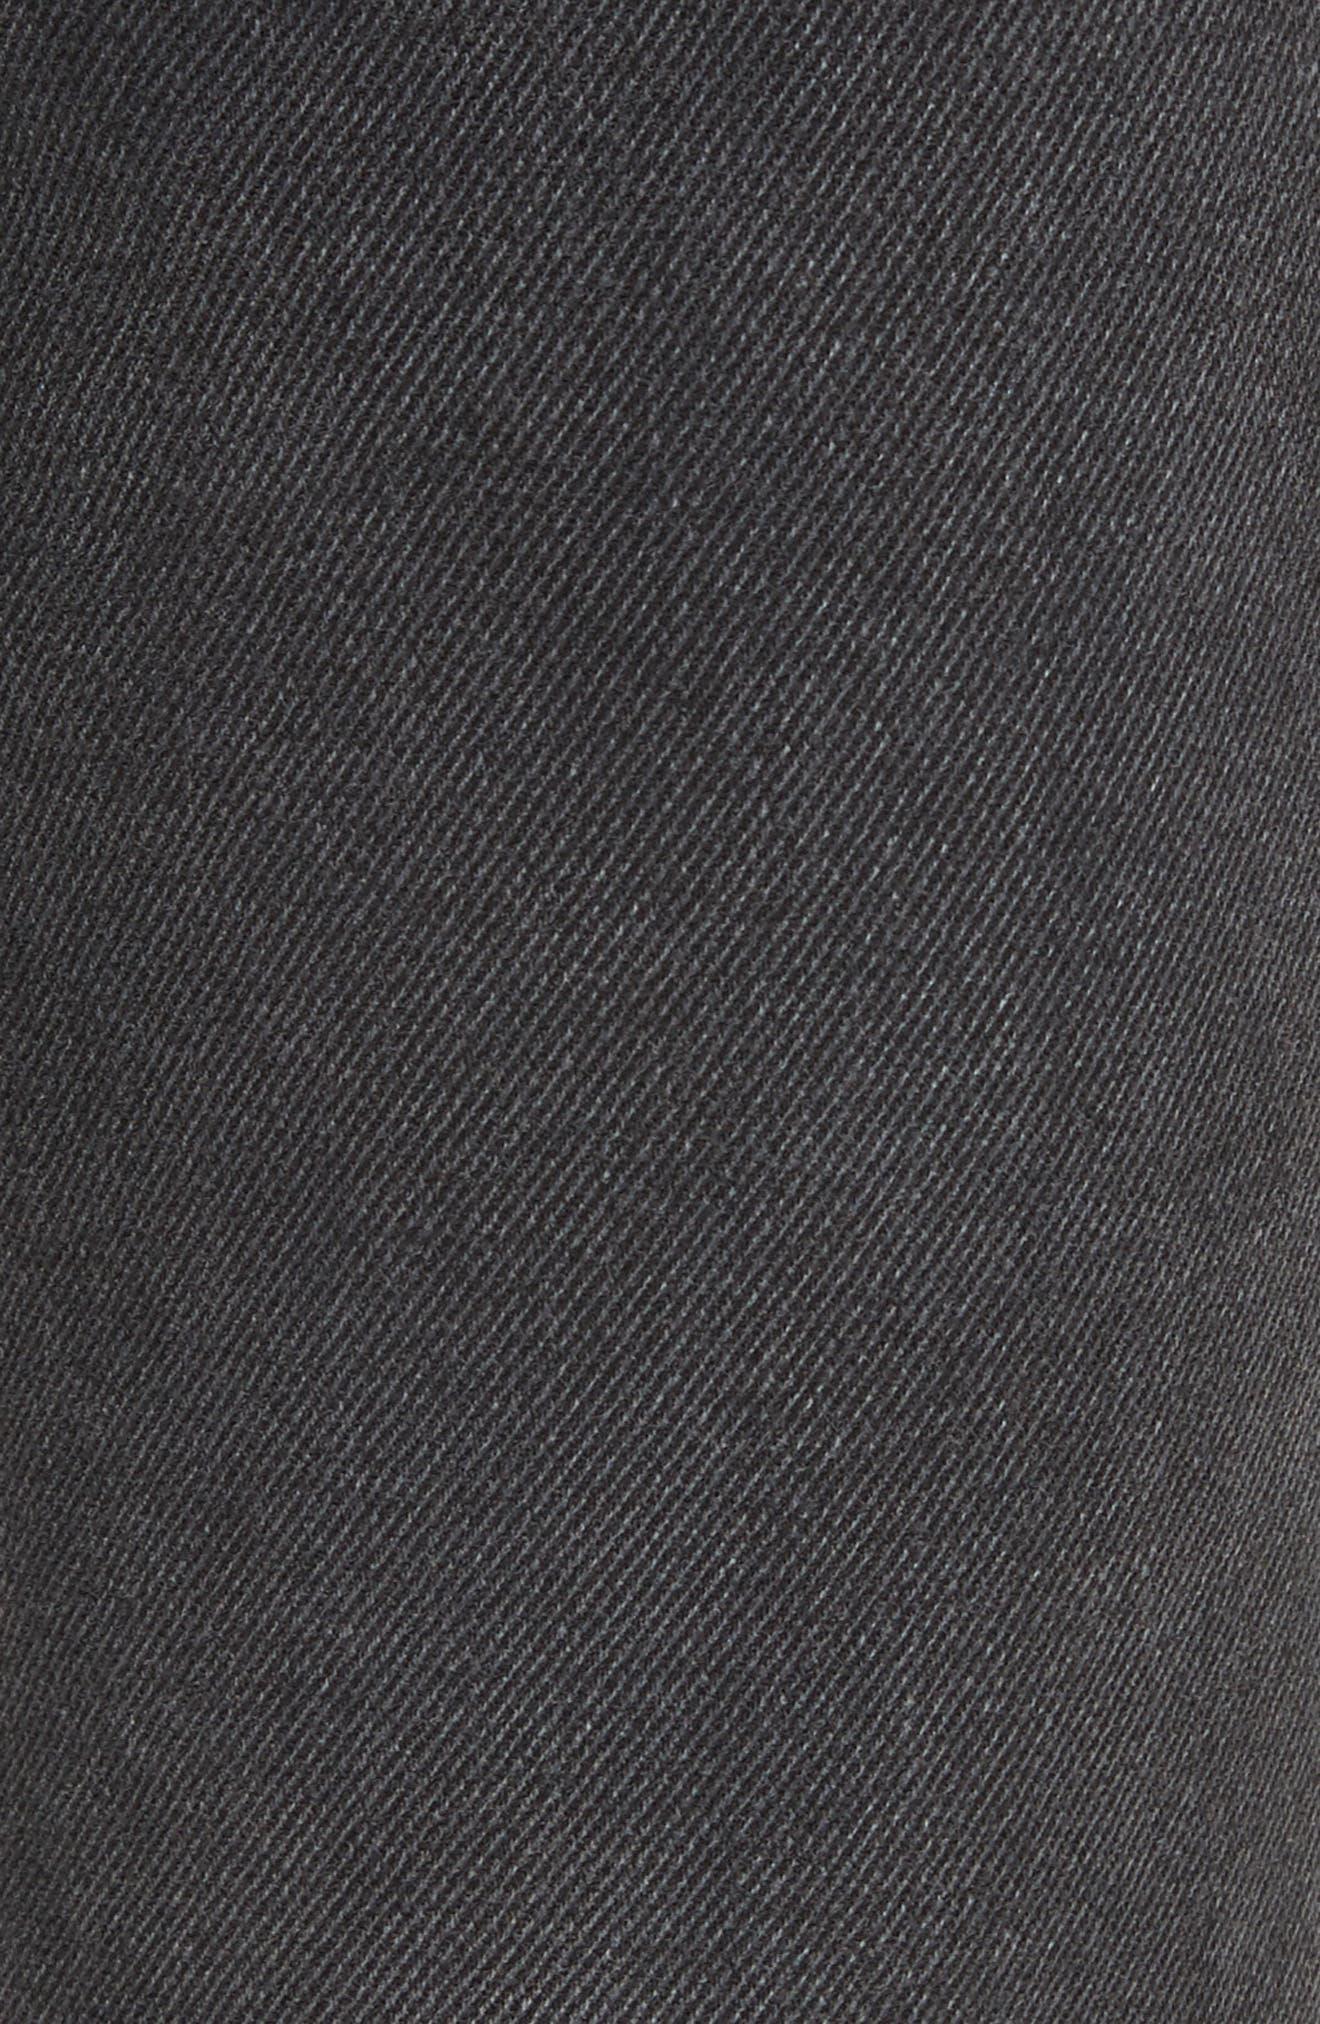 Alternate Image 5  - GRLFRND Helena Rigid High Waist Straight Jeans (Proud Mary)